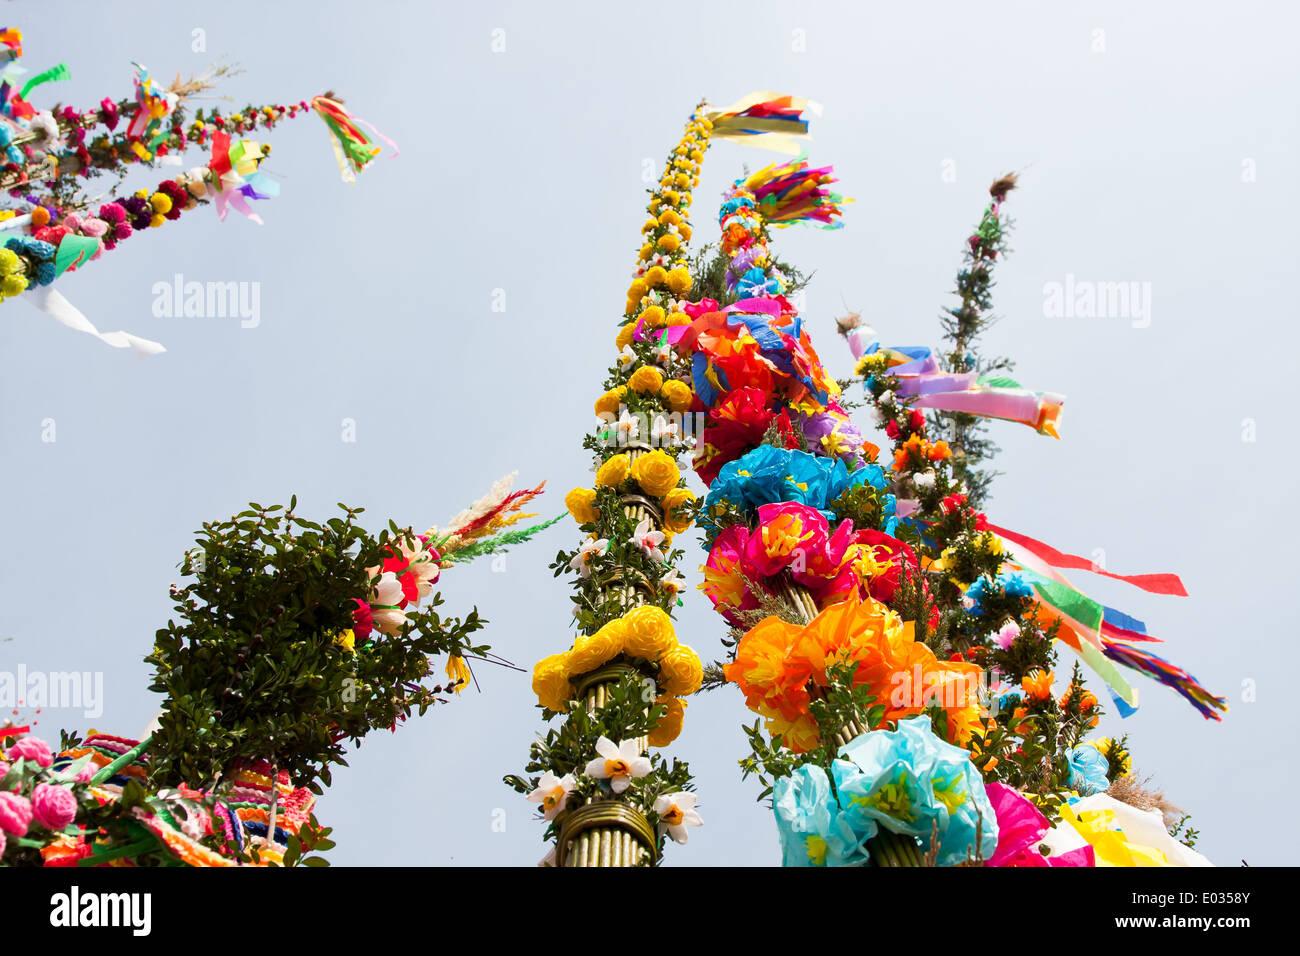 Easter Palm Contest in Lipnica Murowana - Stock Image